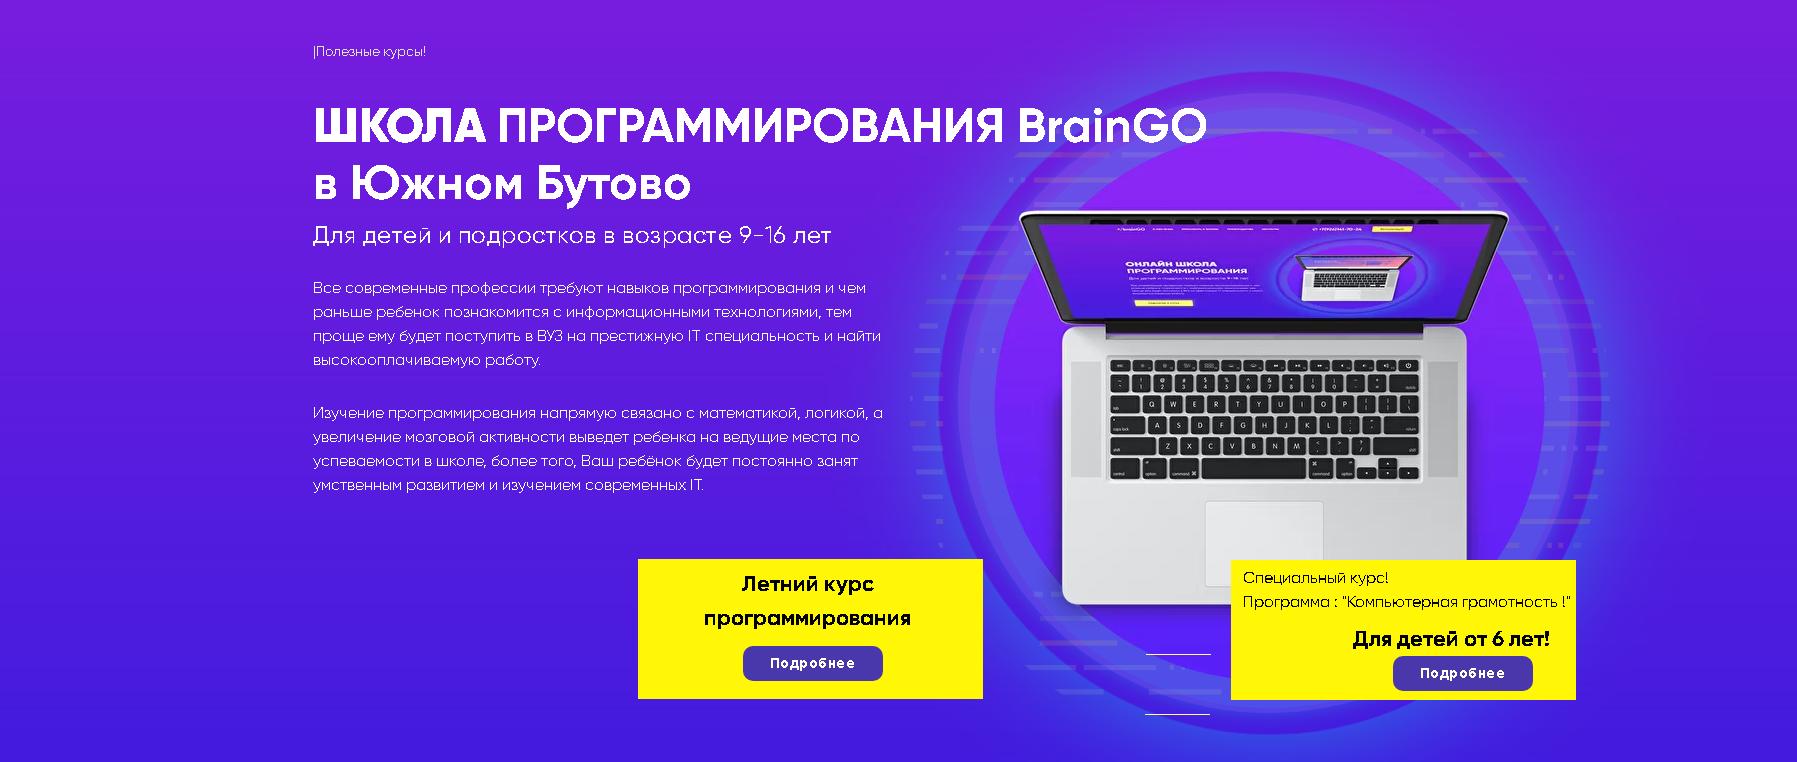 braingo